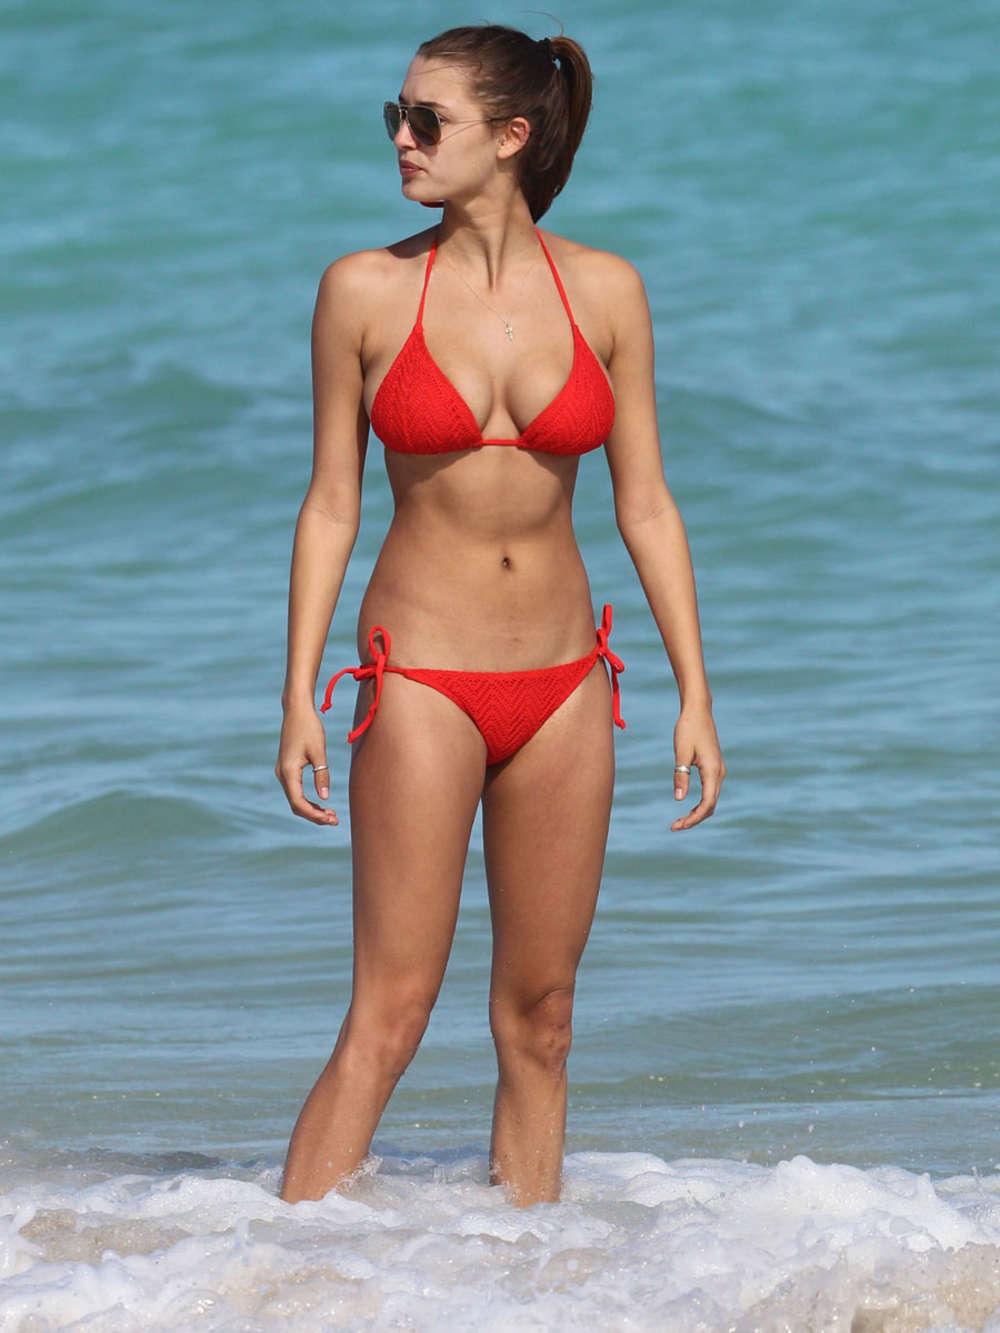 Alyssa Arce 2013 : Alyssa Arce Hot Bikini Photos: Miami -12